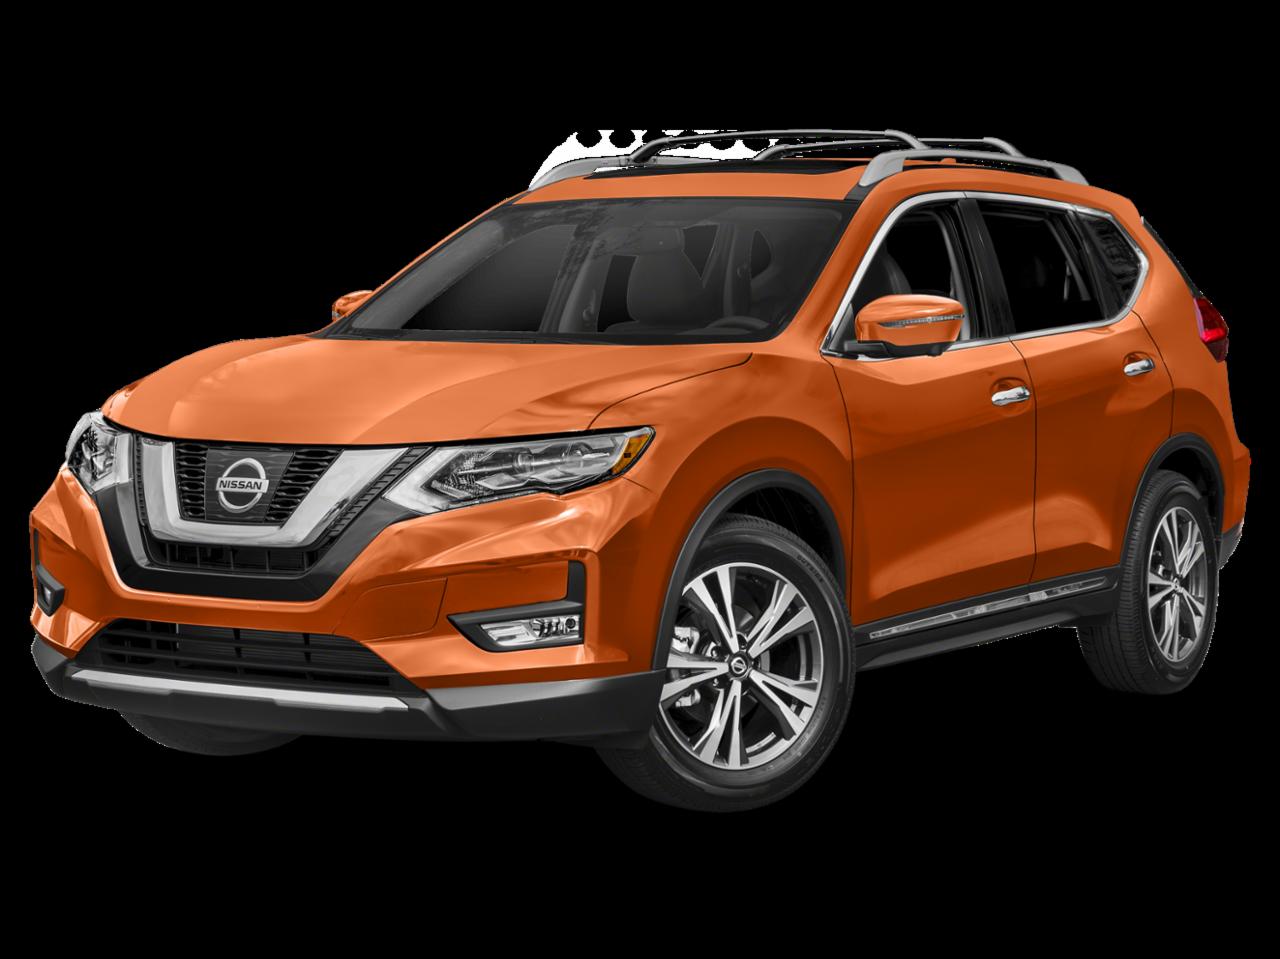 "2018 Nissan<br/><span class=""vdp-trim"">Rogue SL FWD Sport Utility</span>"